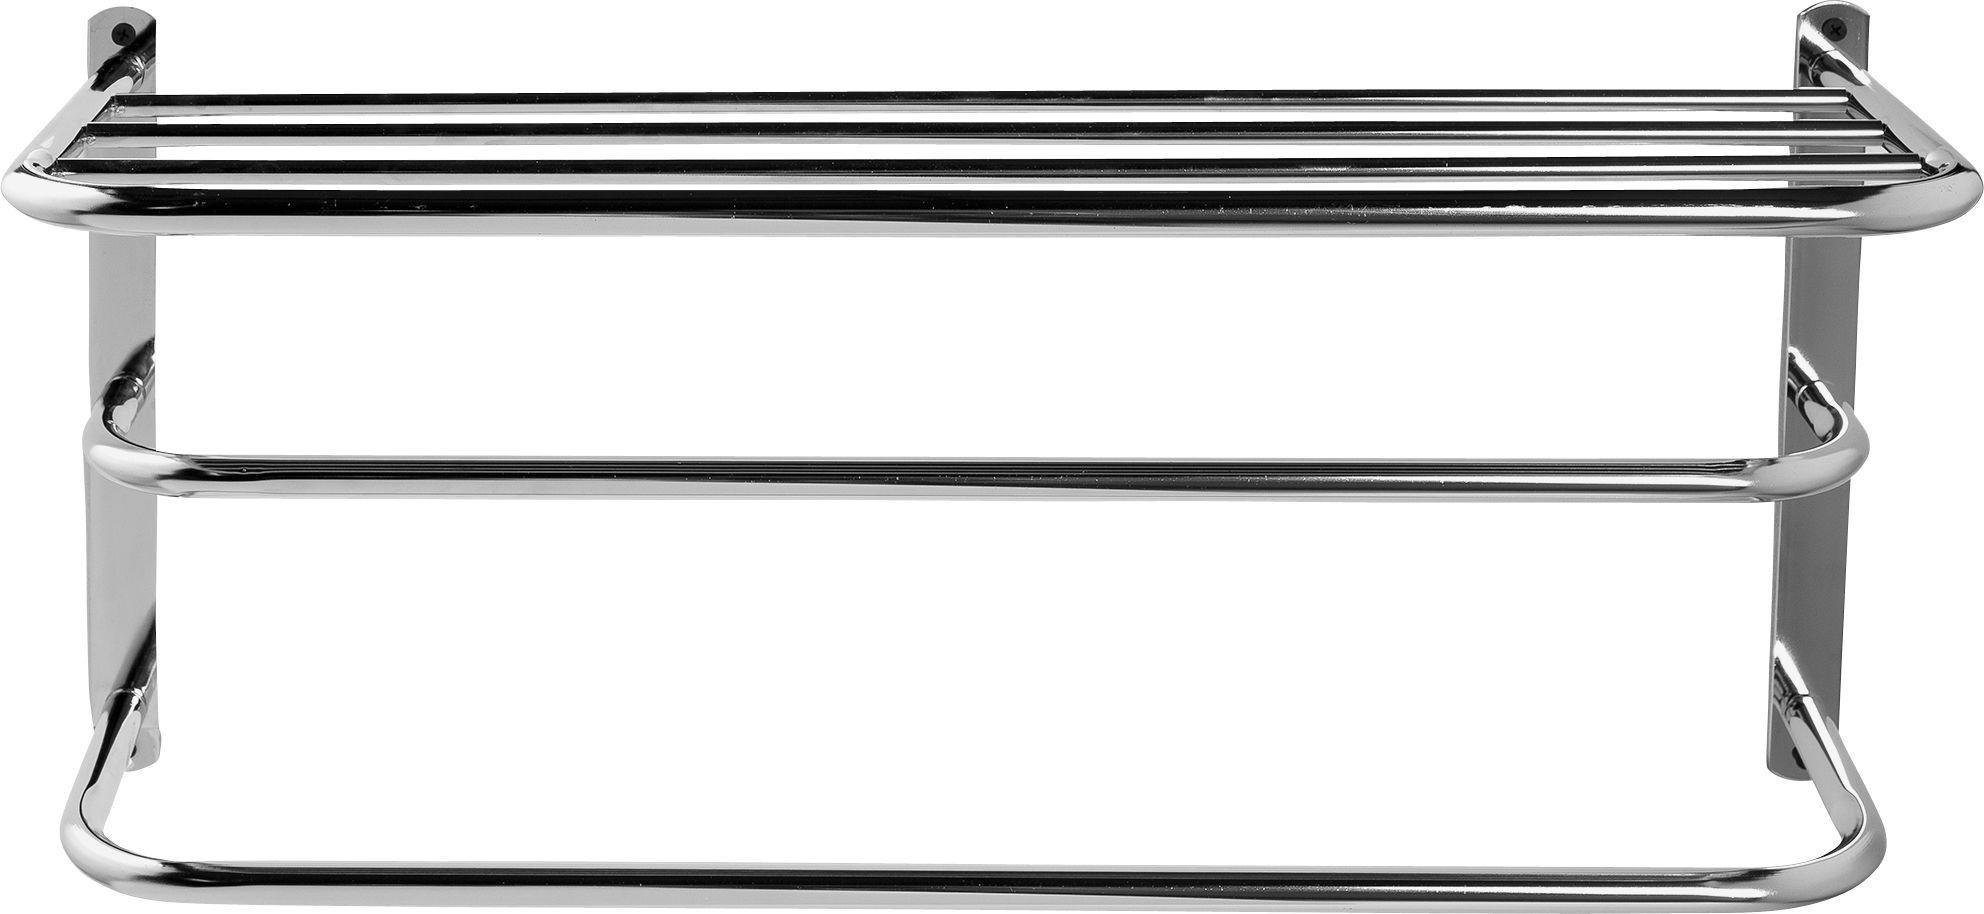 Argos Home - Metal - Towel Rail with Shelf